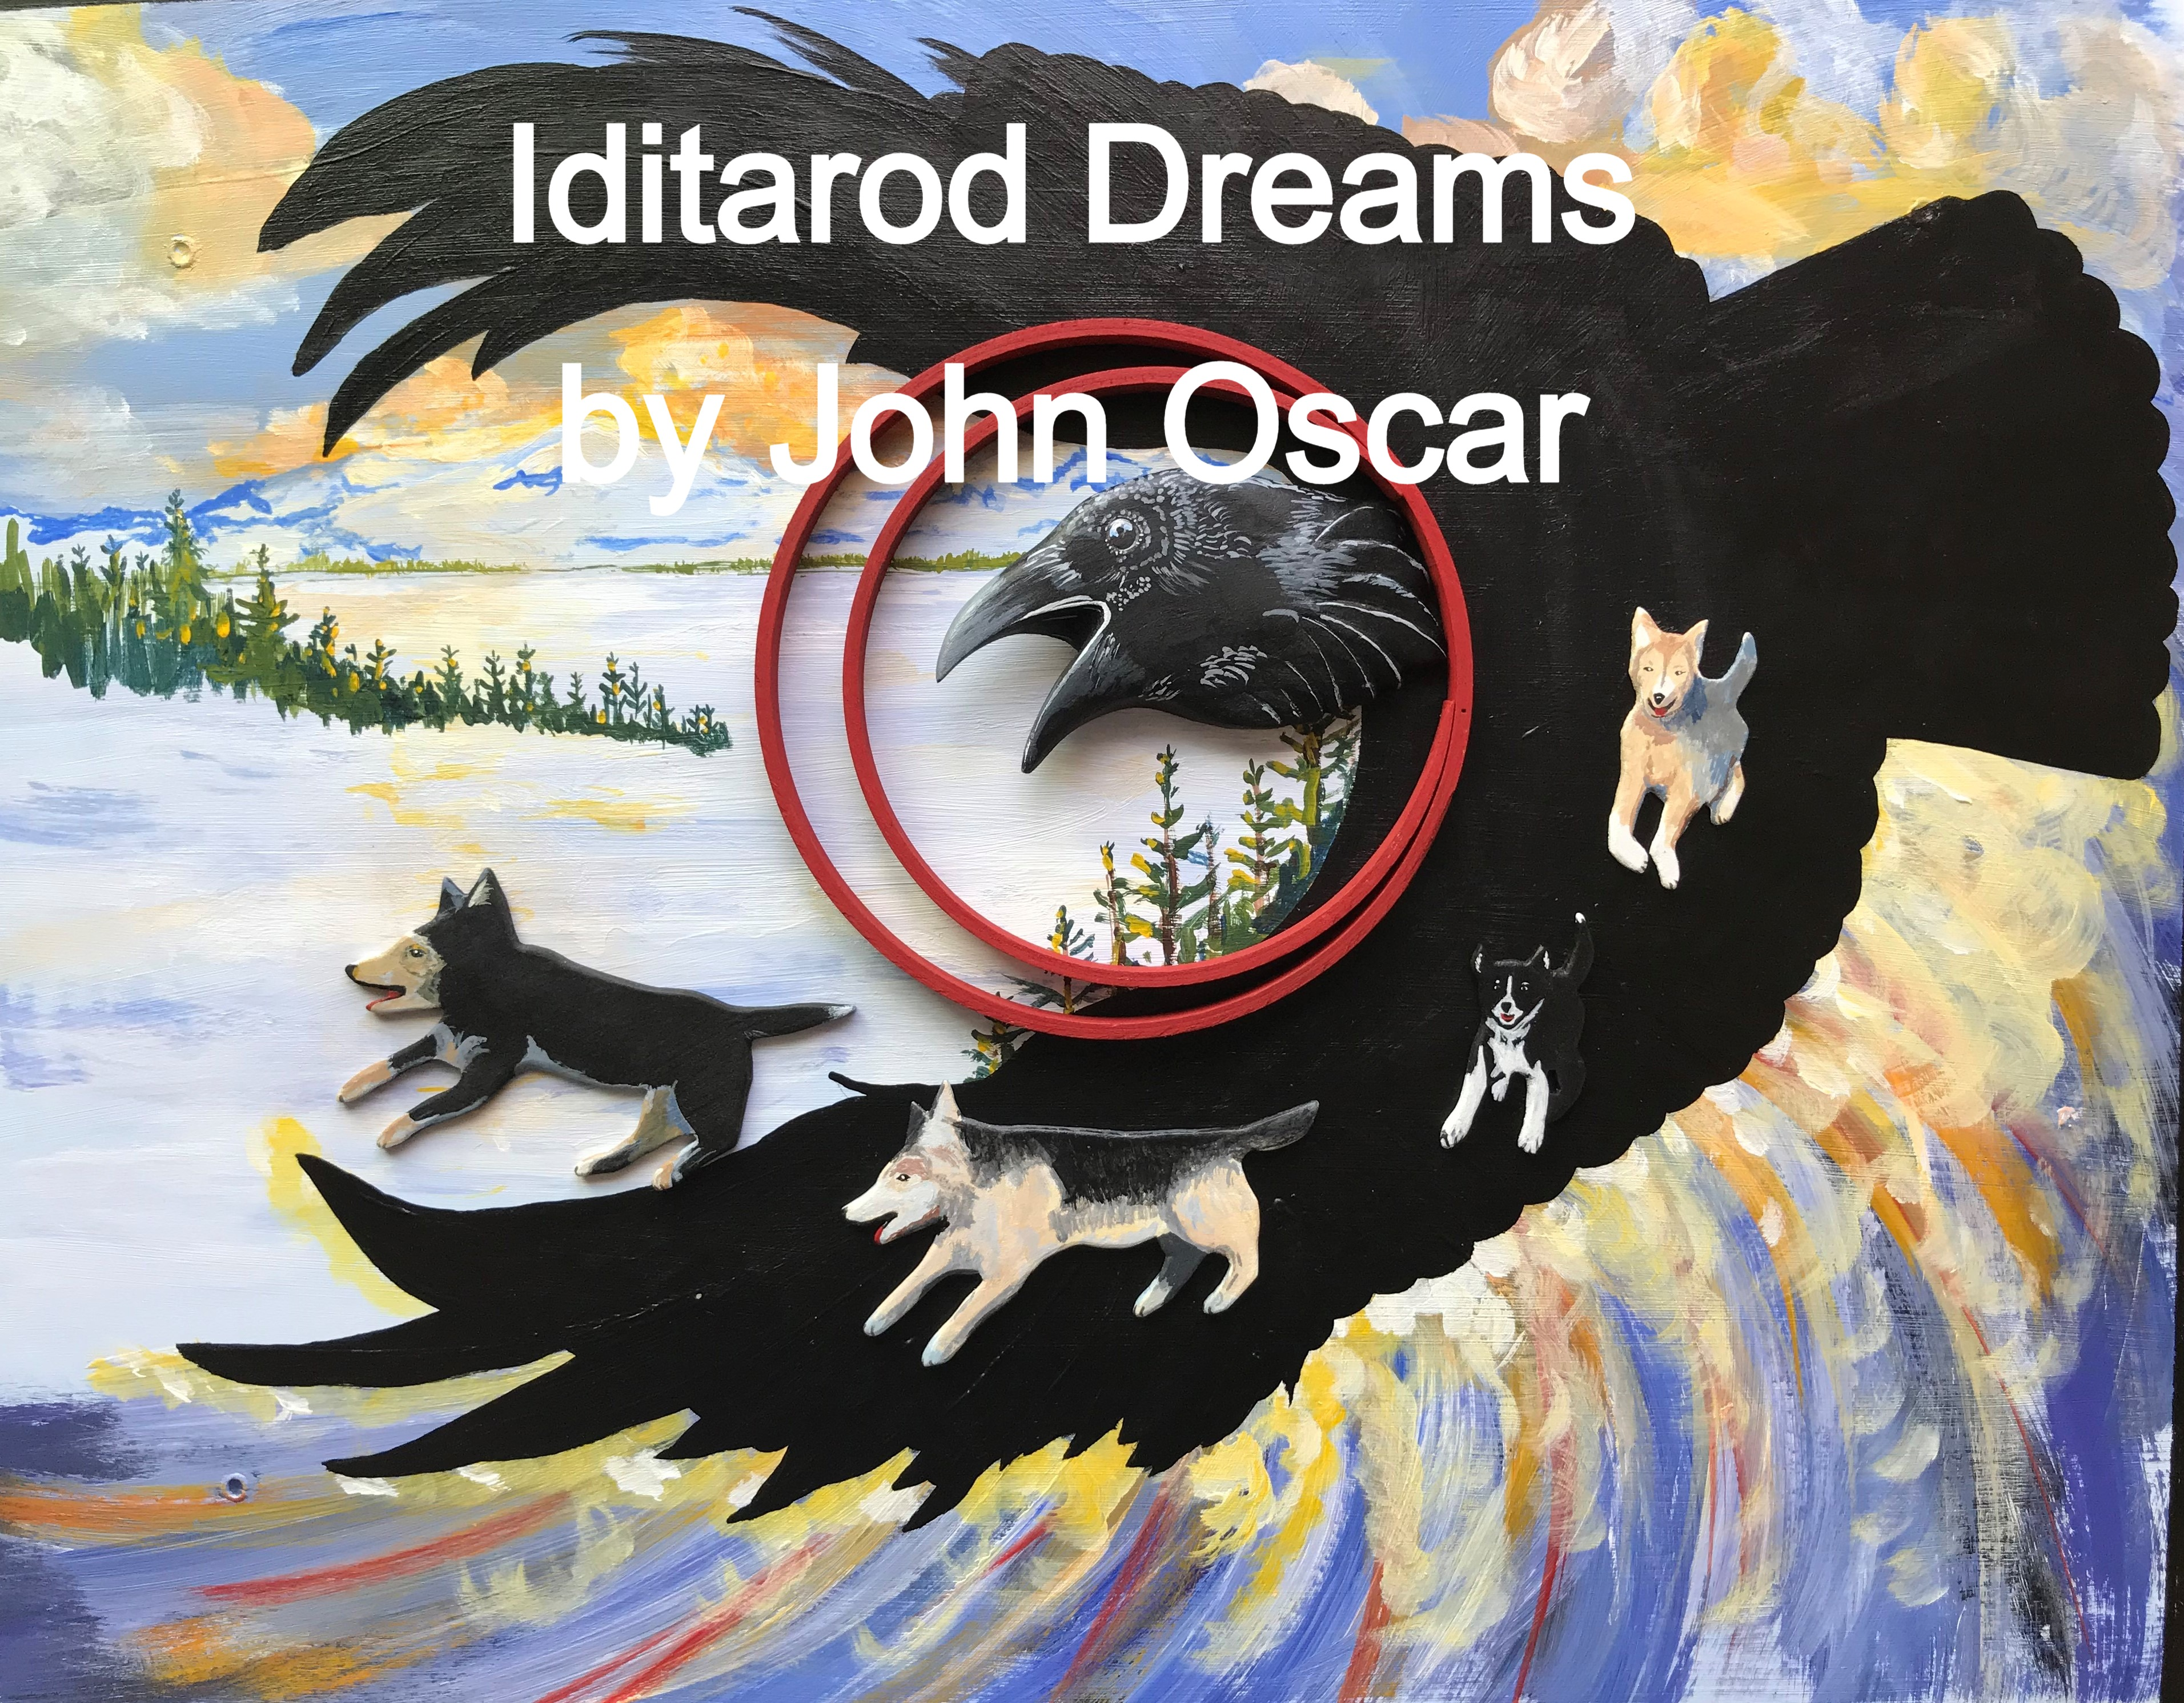 Iditarod Dreams